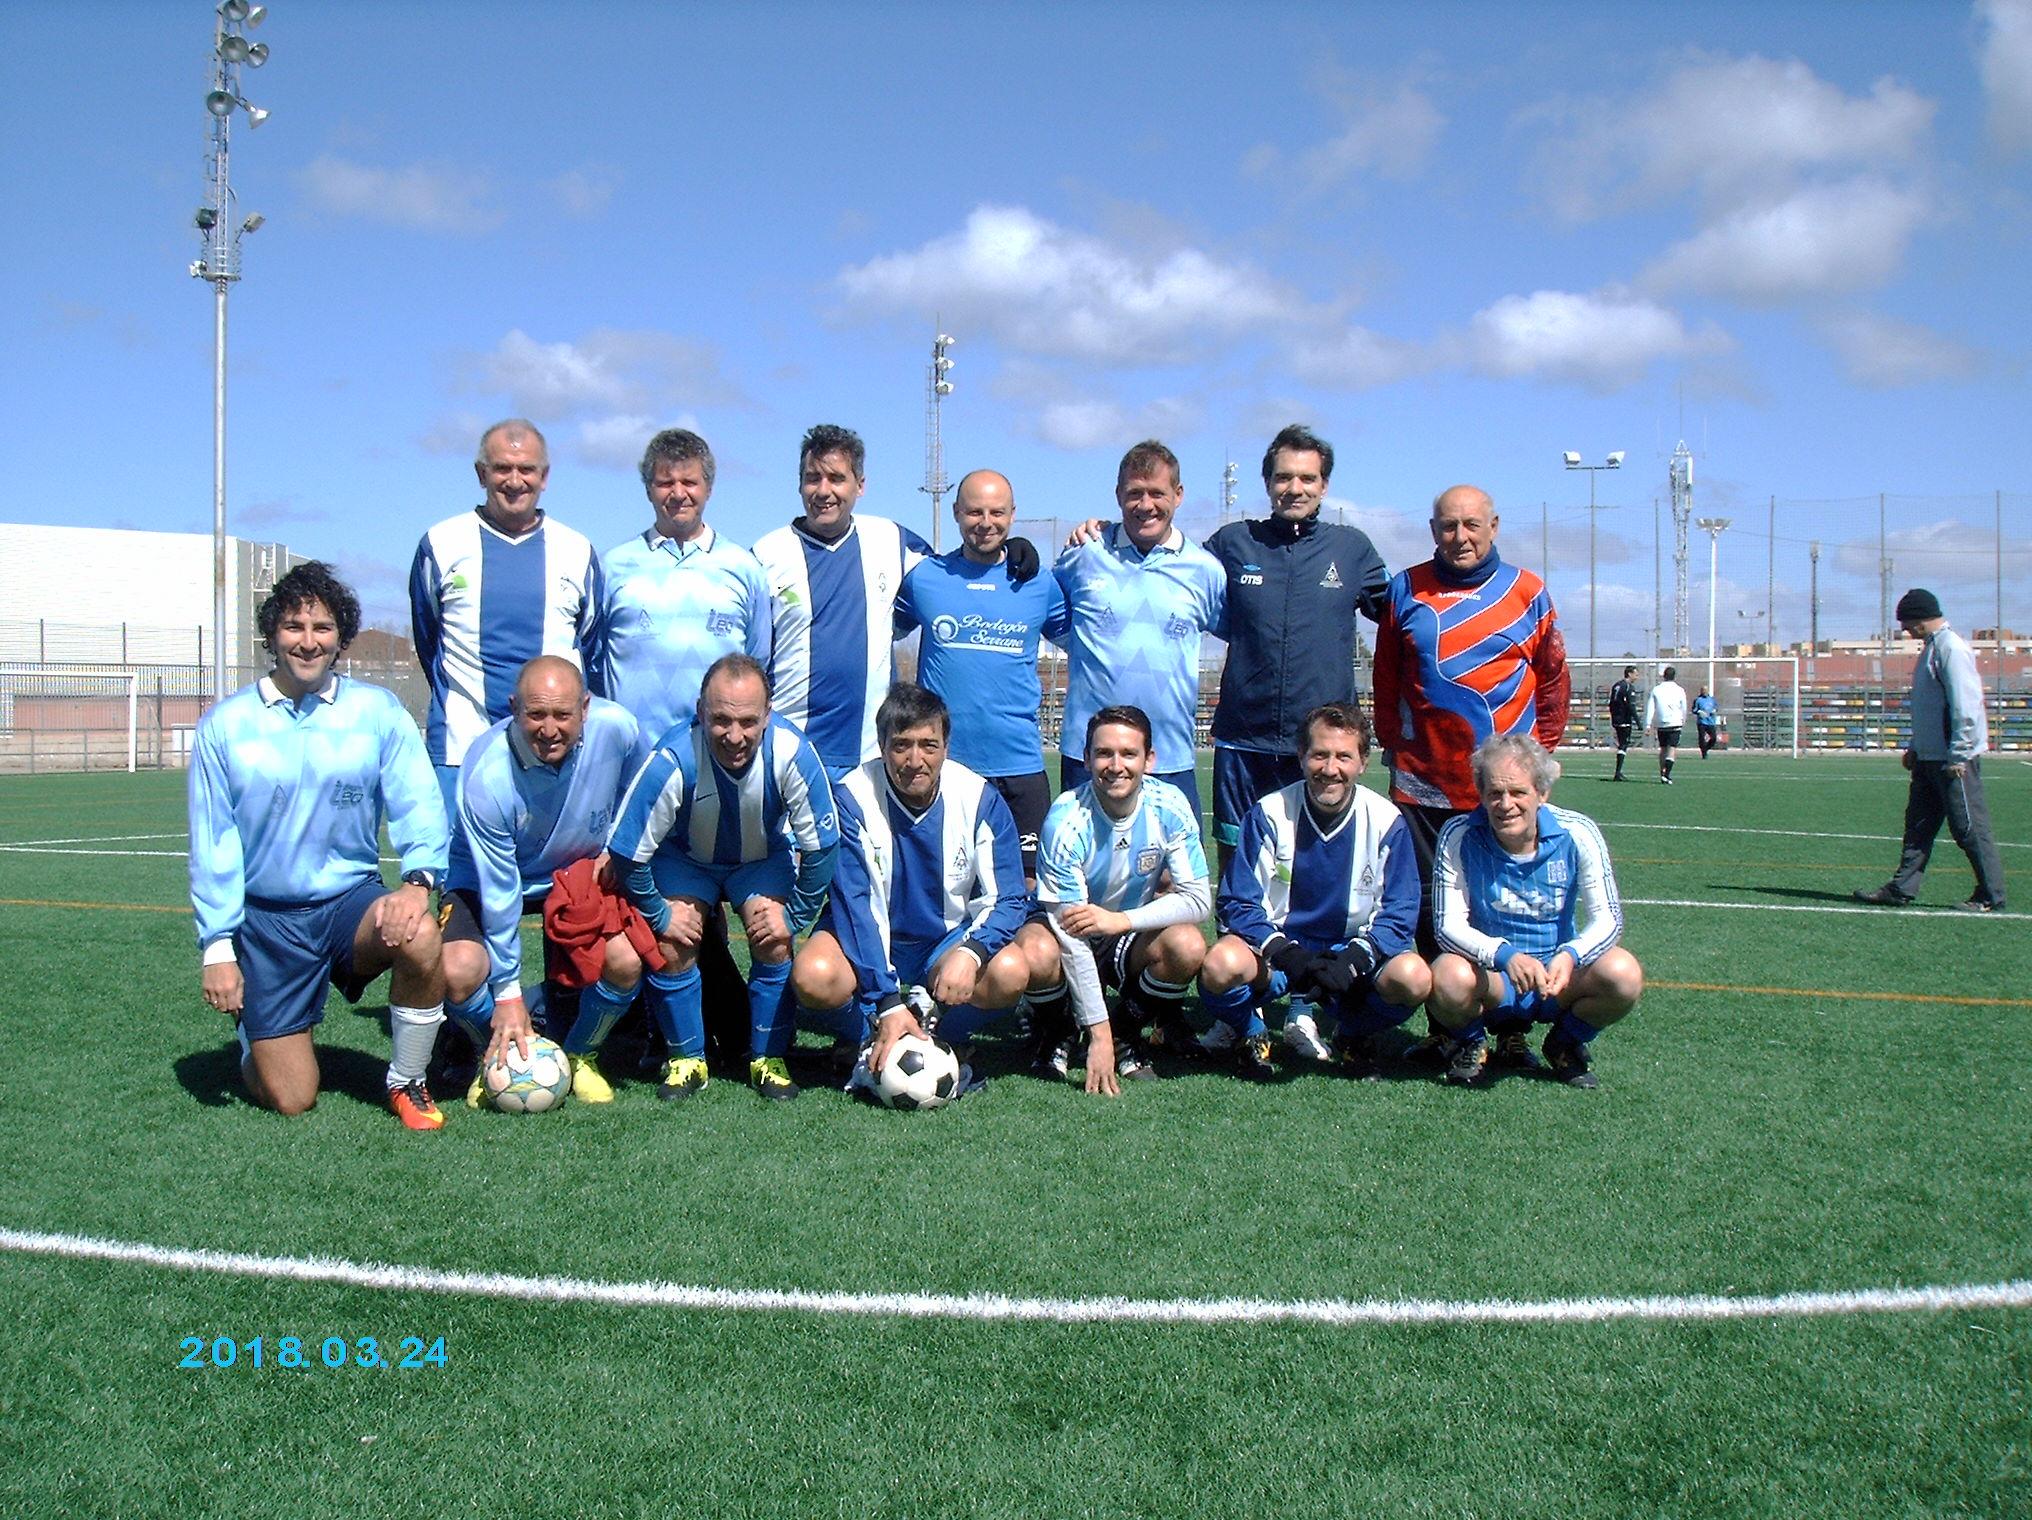 Encuentro Fútbol Arquitectónico: A.CR.C.F. - A.AB.C.F.